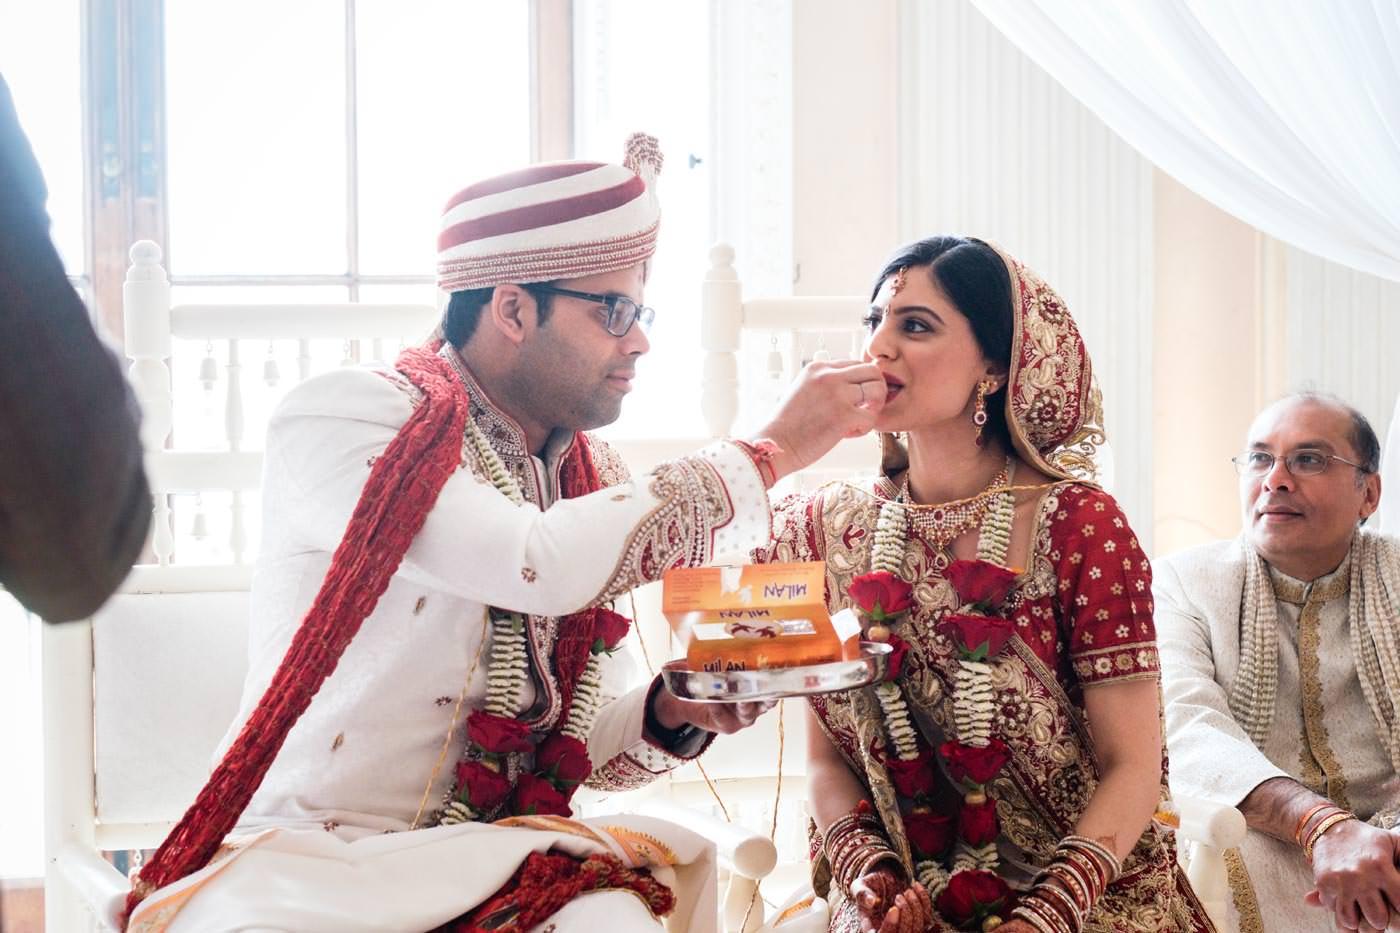 Groom feeding bride at Hindu wedding ceremony at Ragley Hall